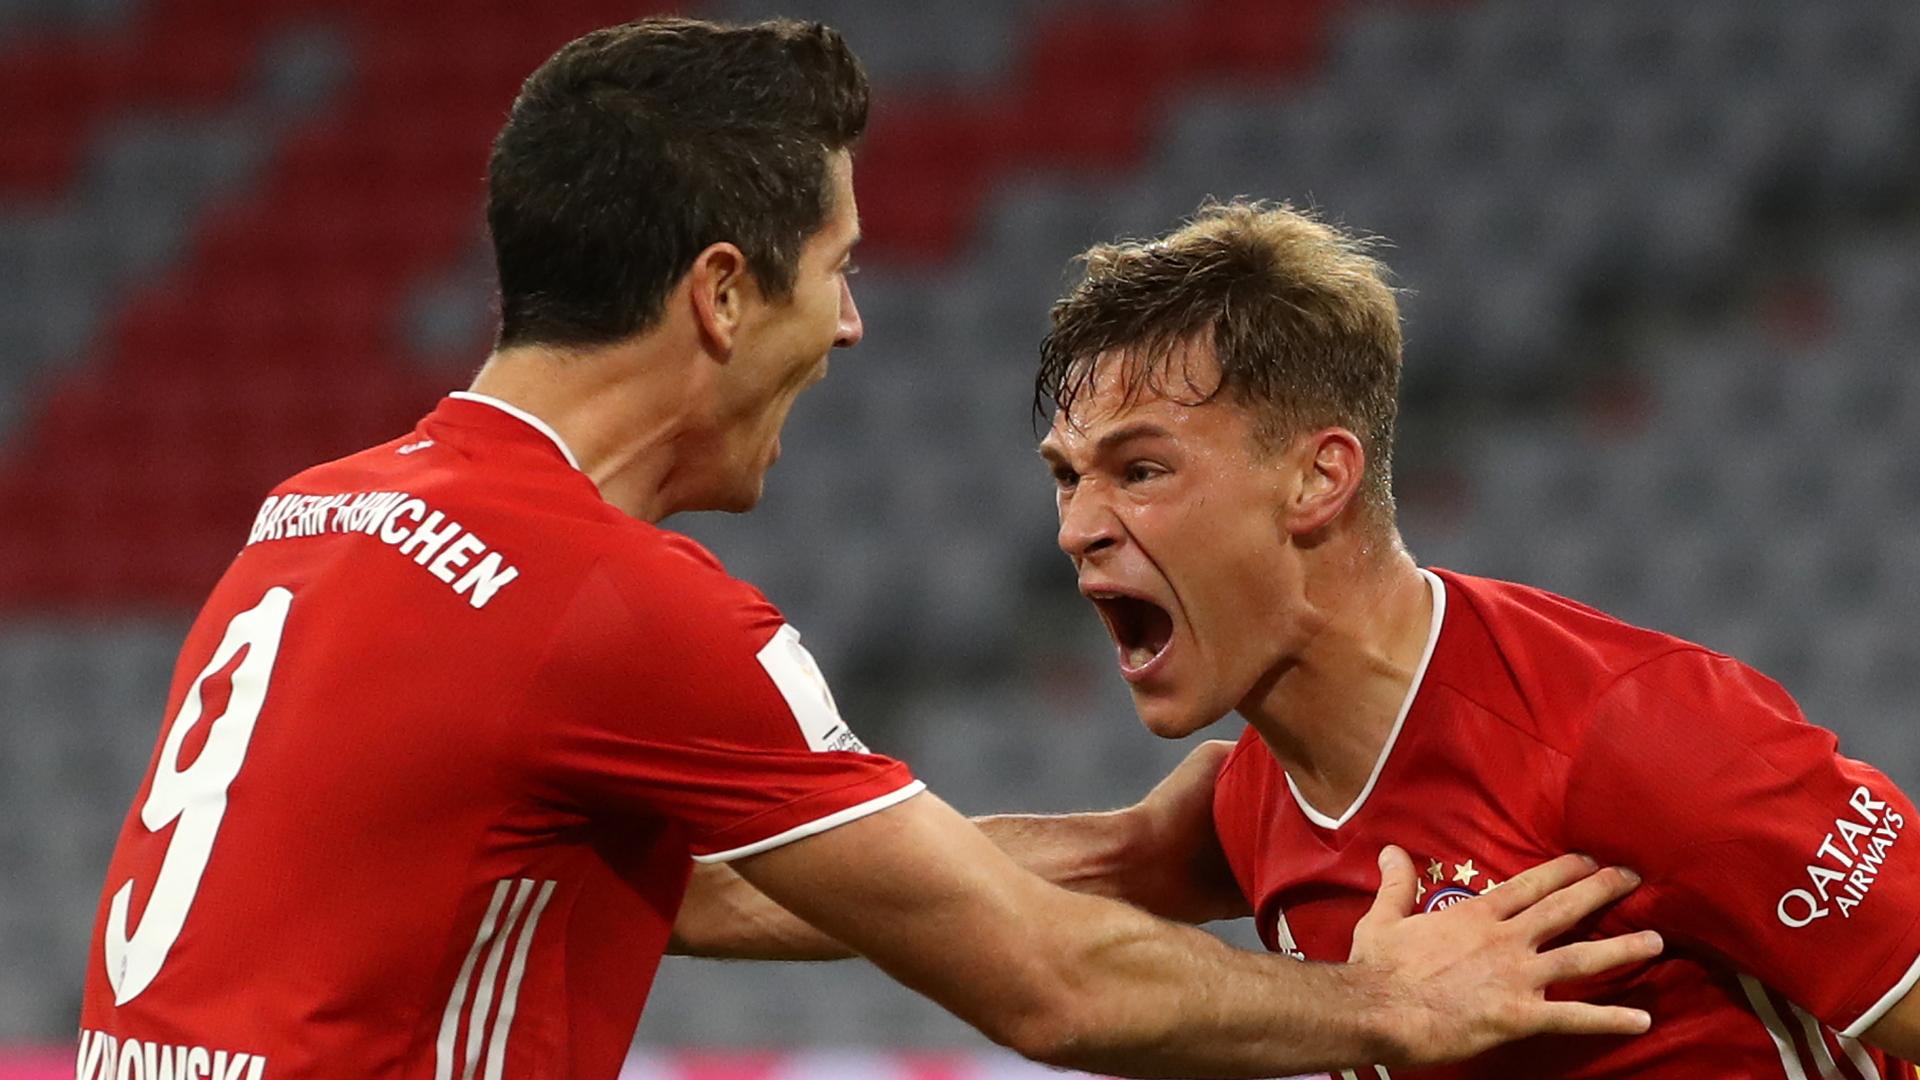 Kimmich sets new record in 50th Champions League match as Bayern Munich thrash Lazio